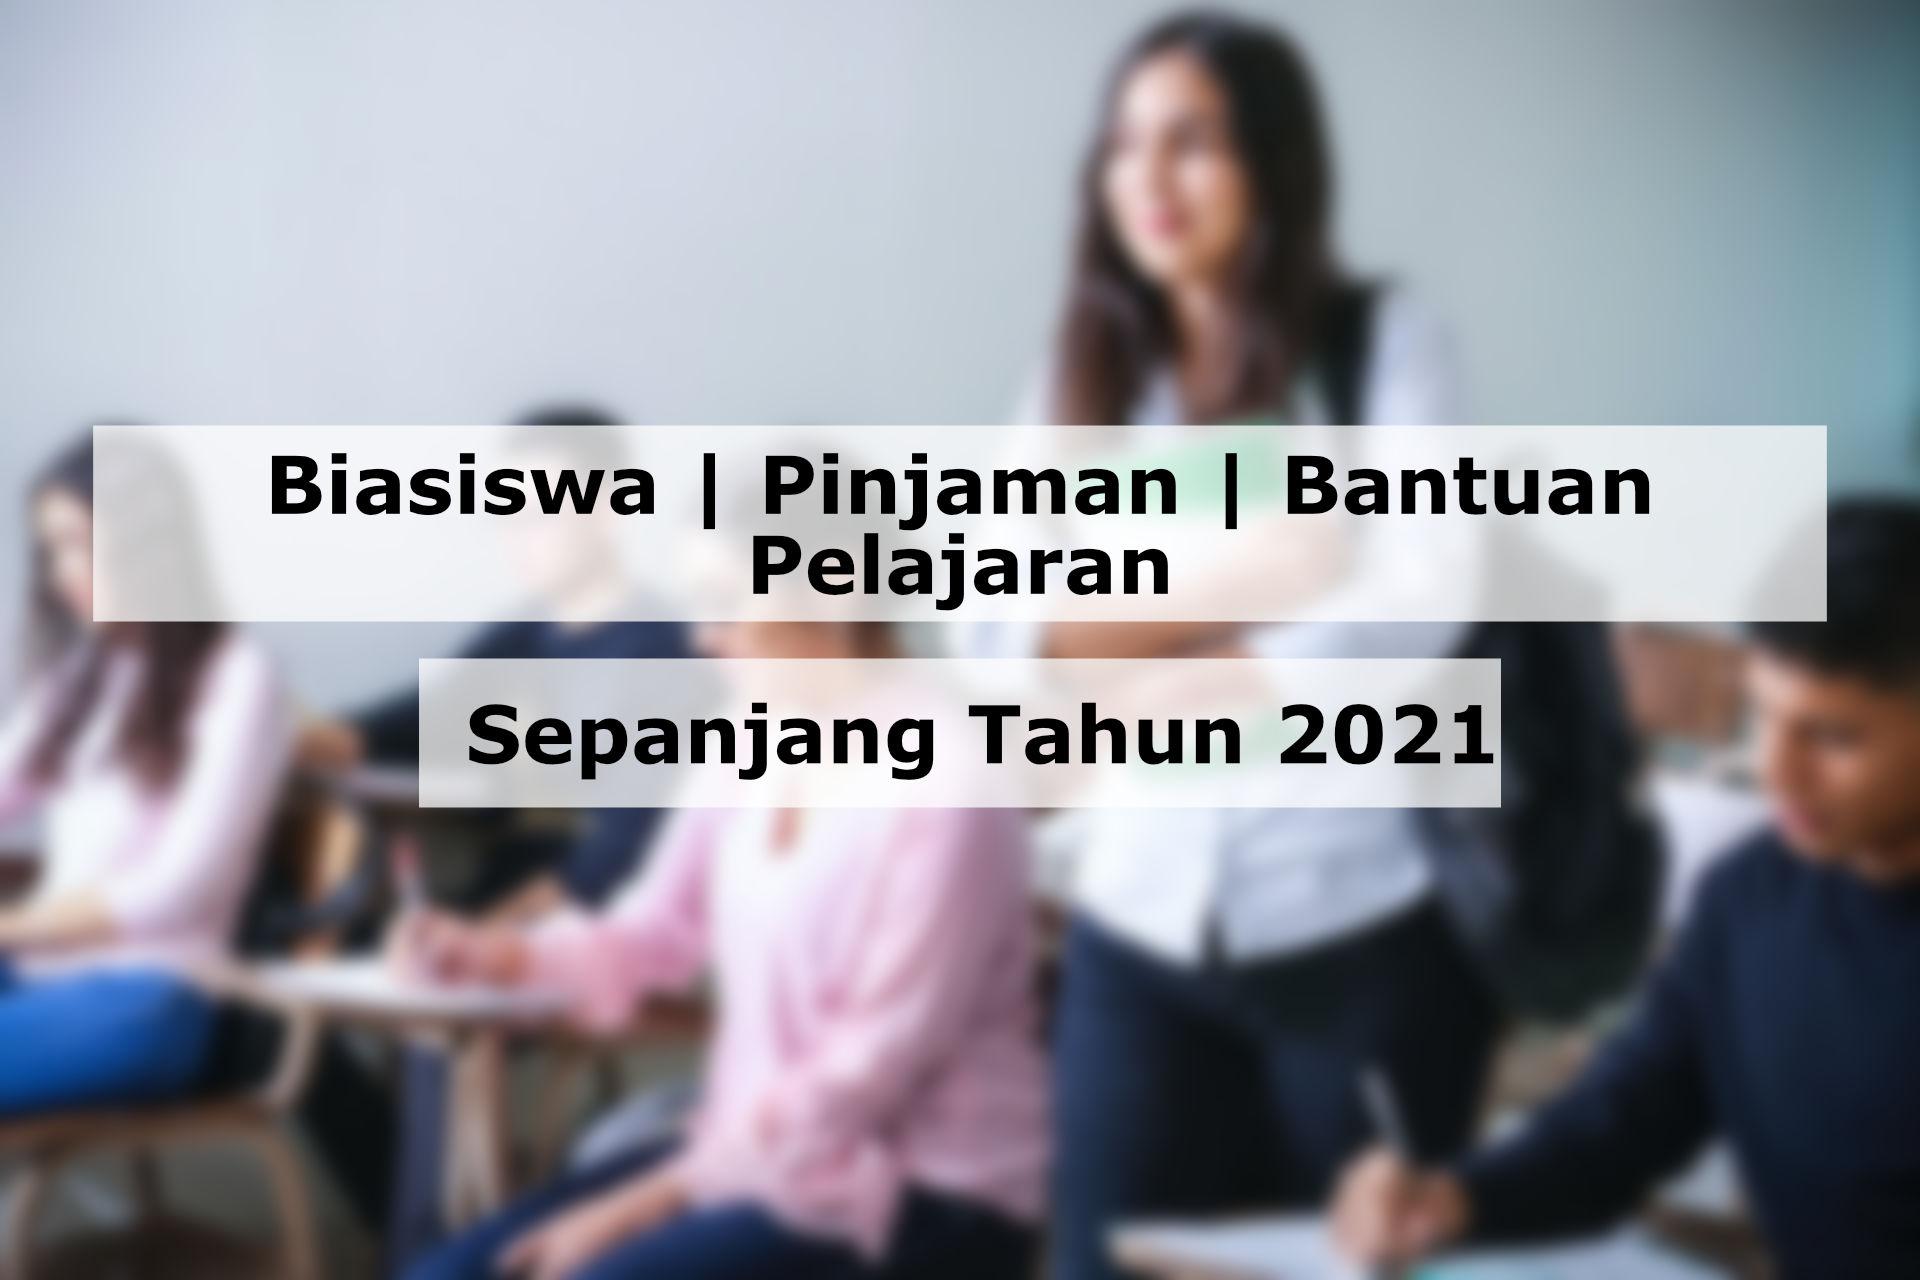 Senarai Biasiswa, Pinjaman Dan Bantuan Pelajaran Untuk Tahun 2021